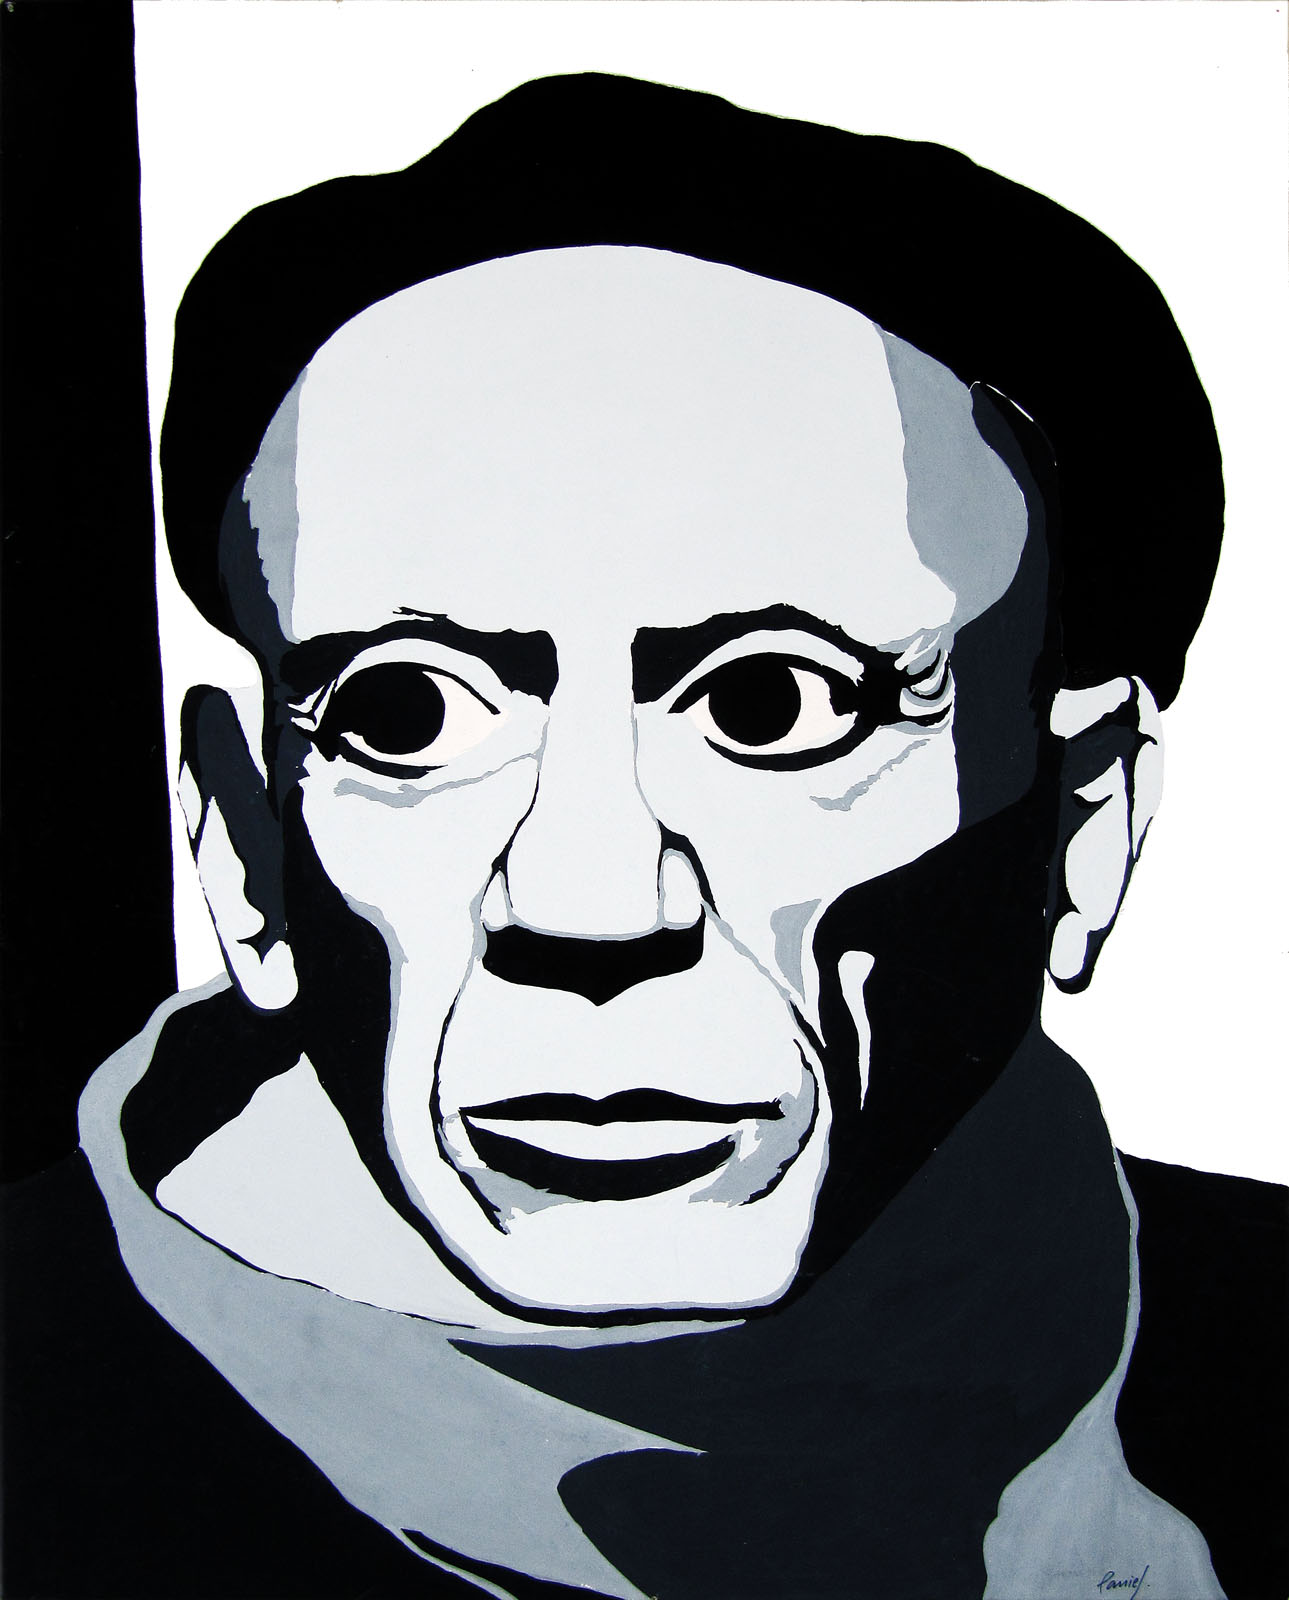 panies-danielvillalobos-painting-twentiethcentury-pop-art-6